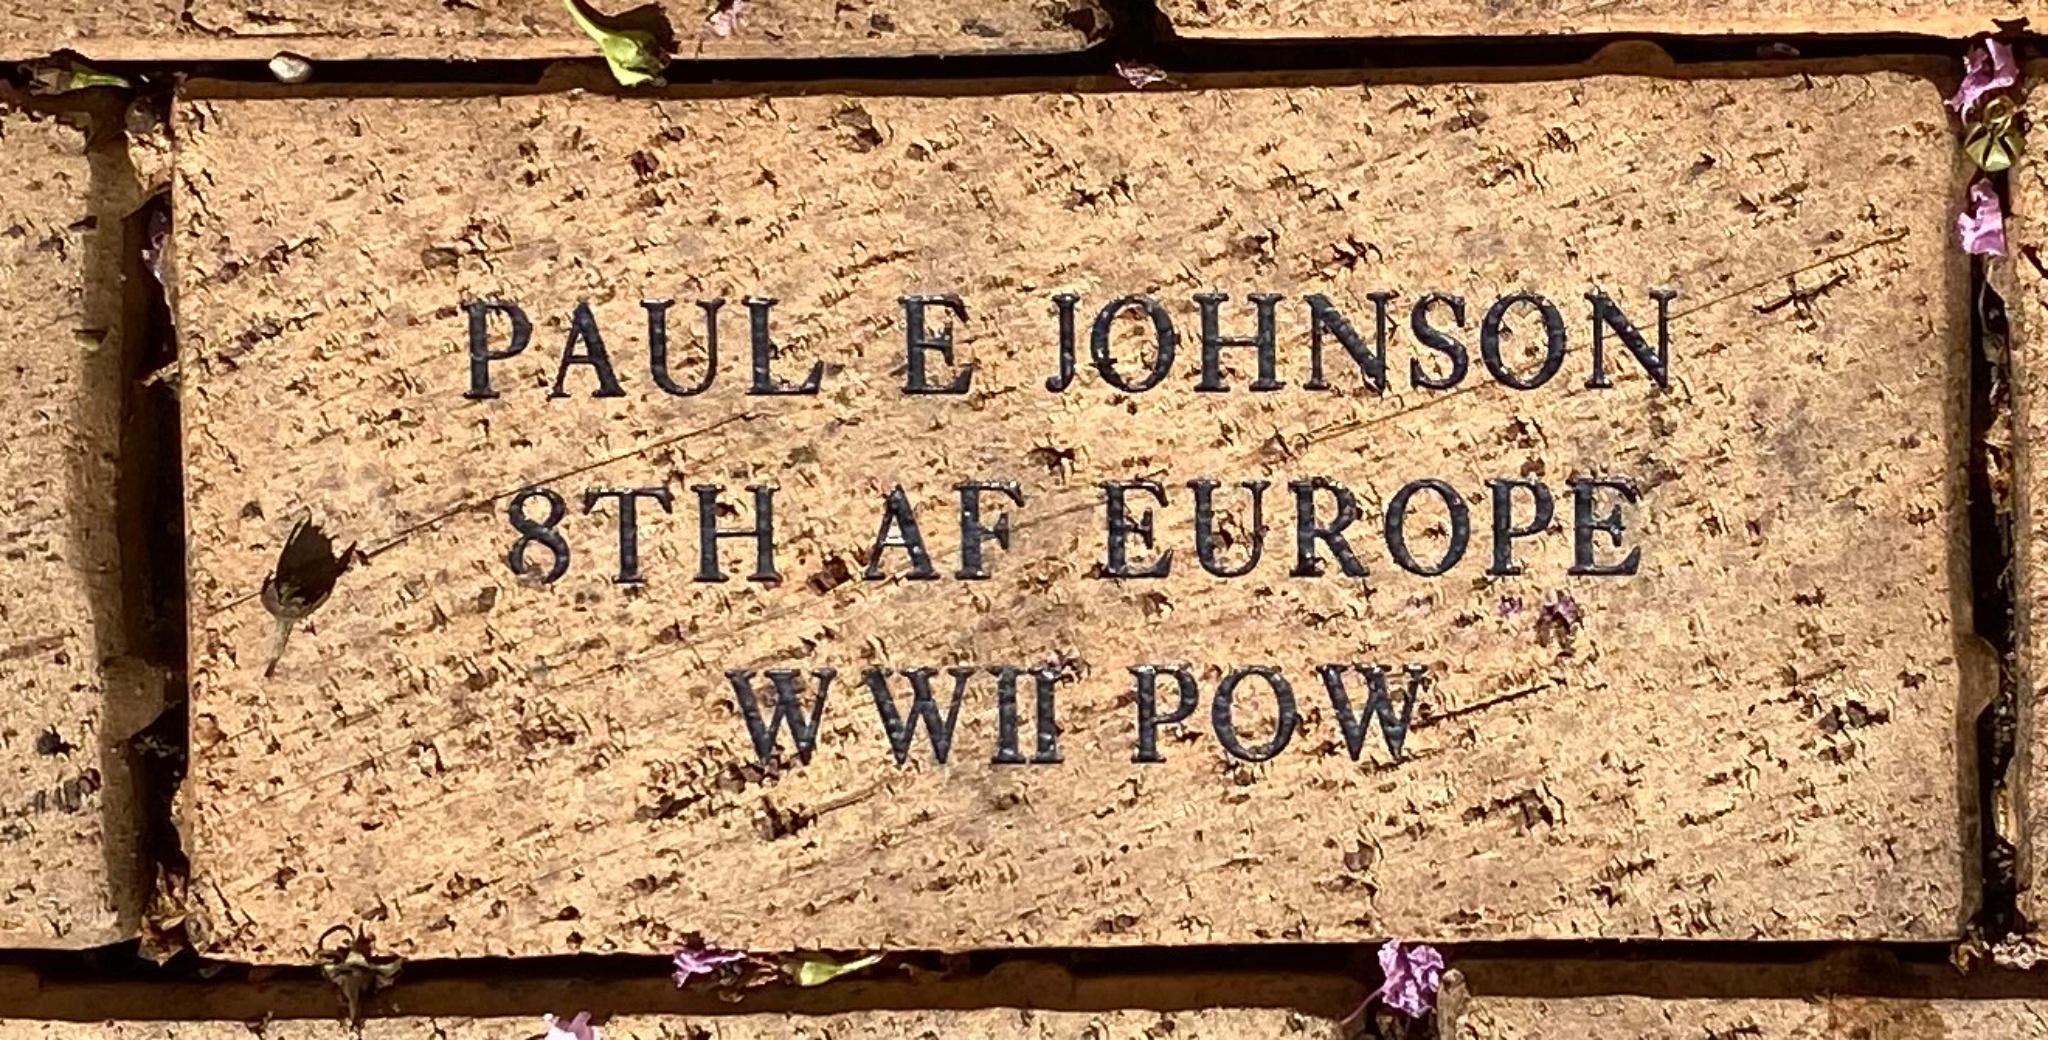 PAUL E JOHNSON 8TH AF EUROPE WWII POW